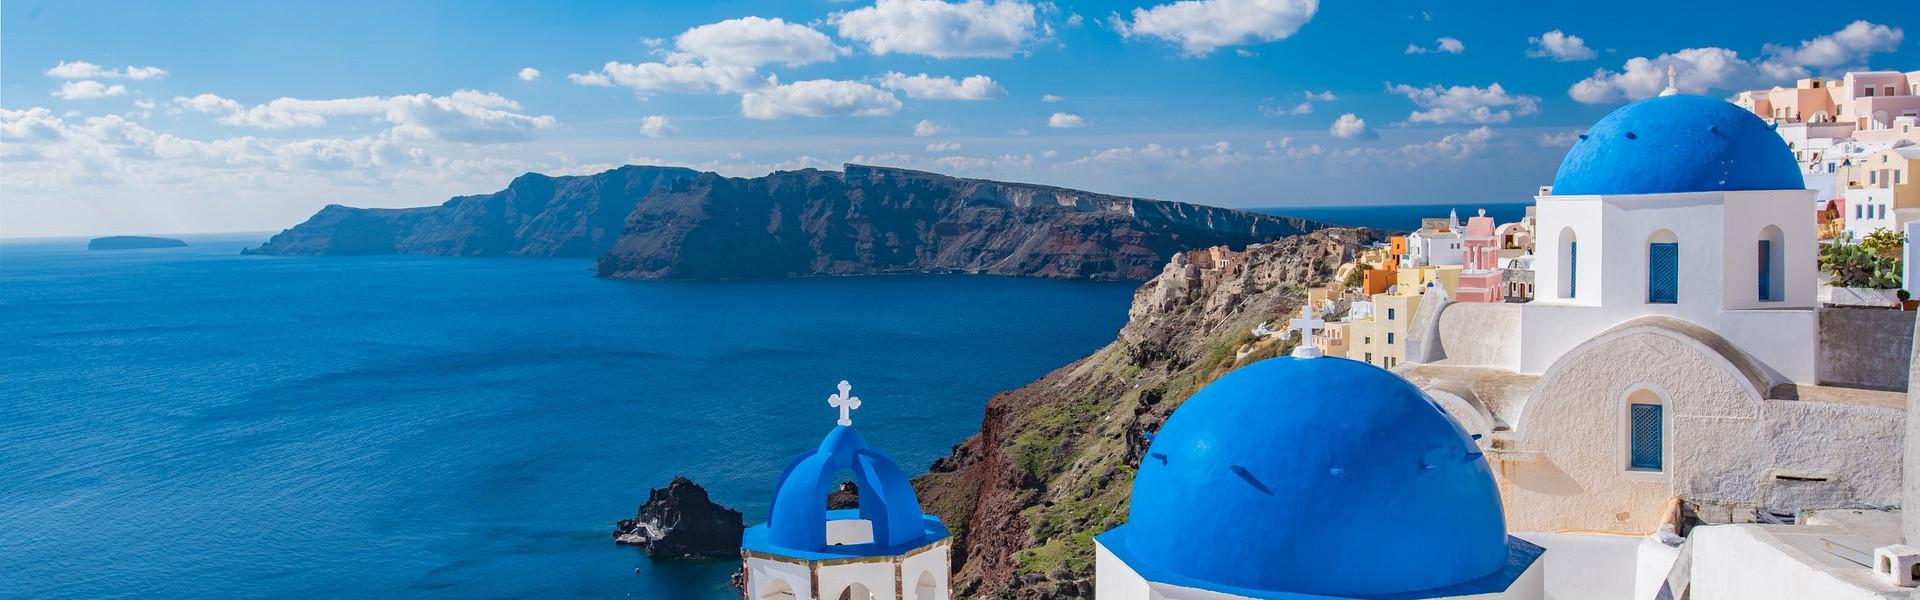 Destination image of Greece